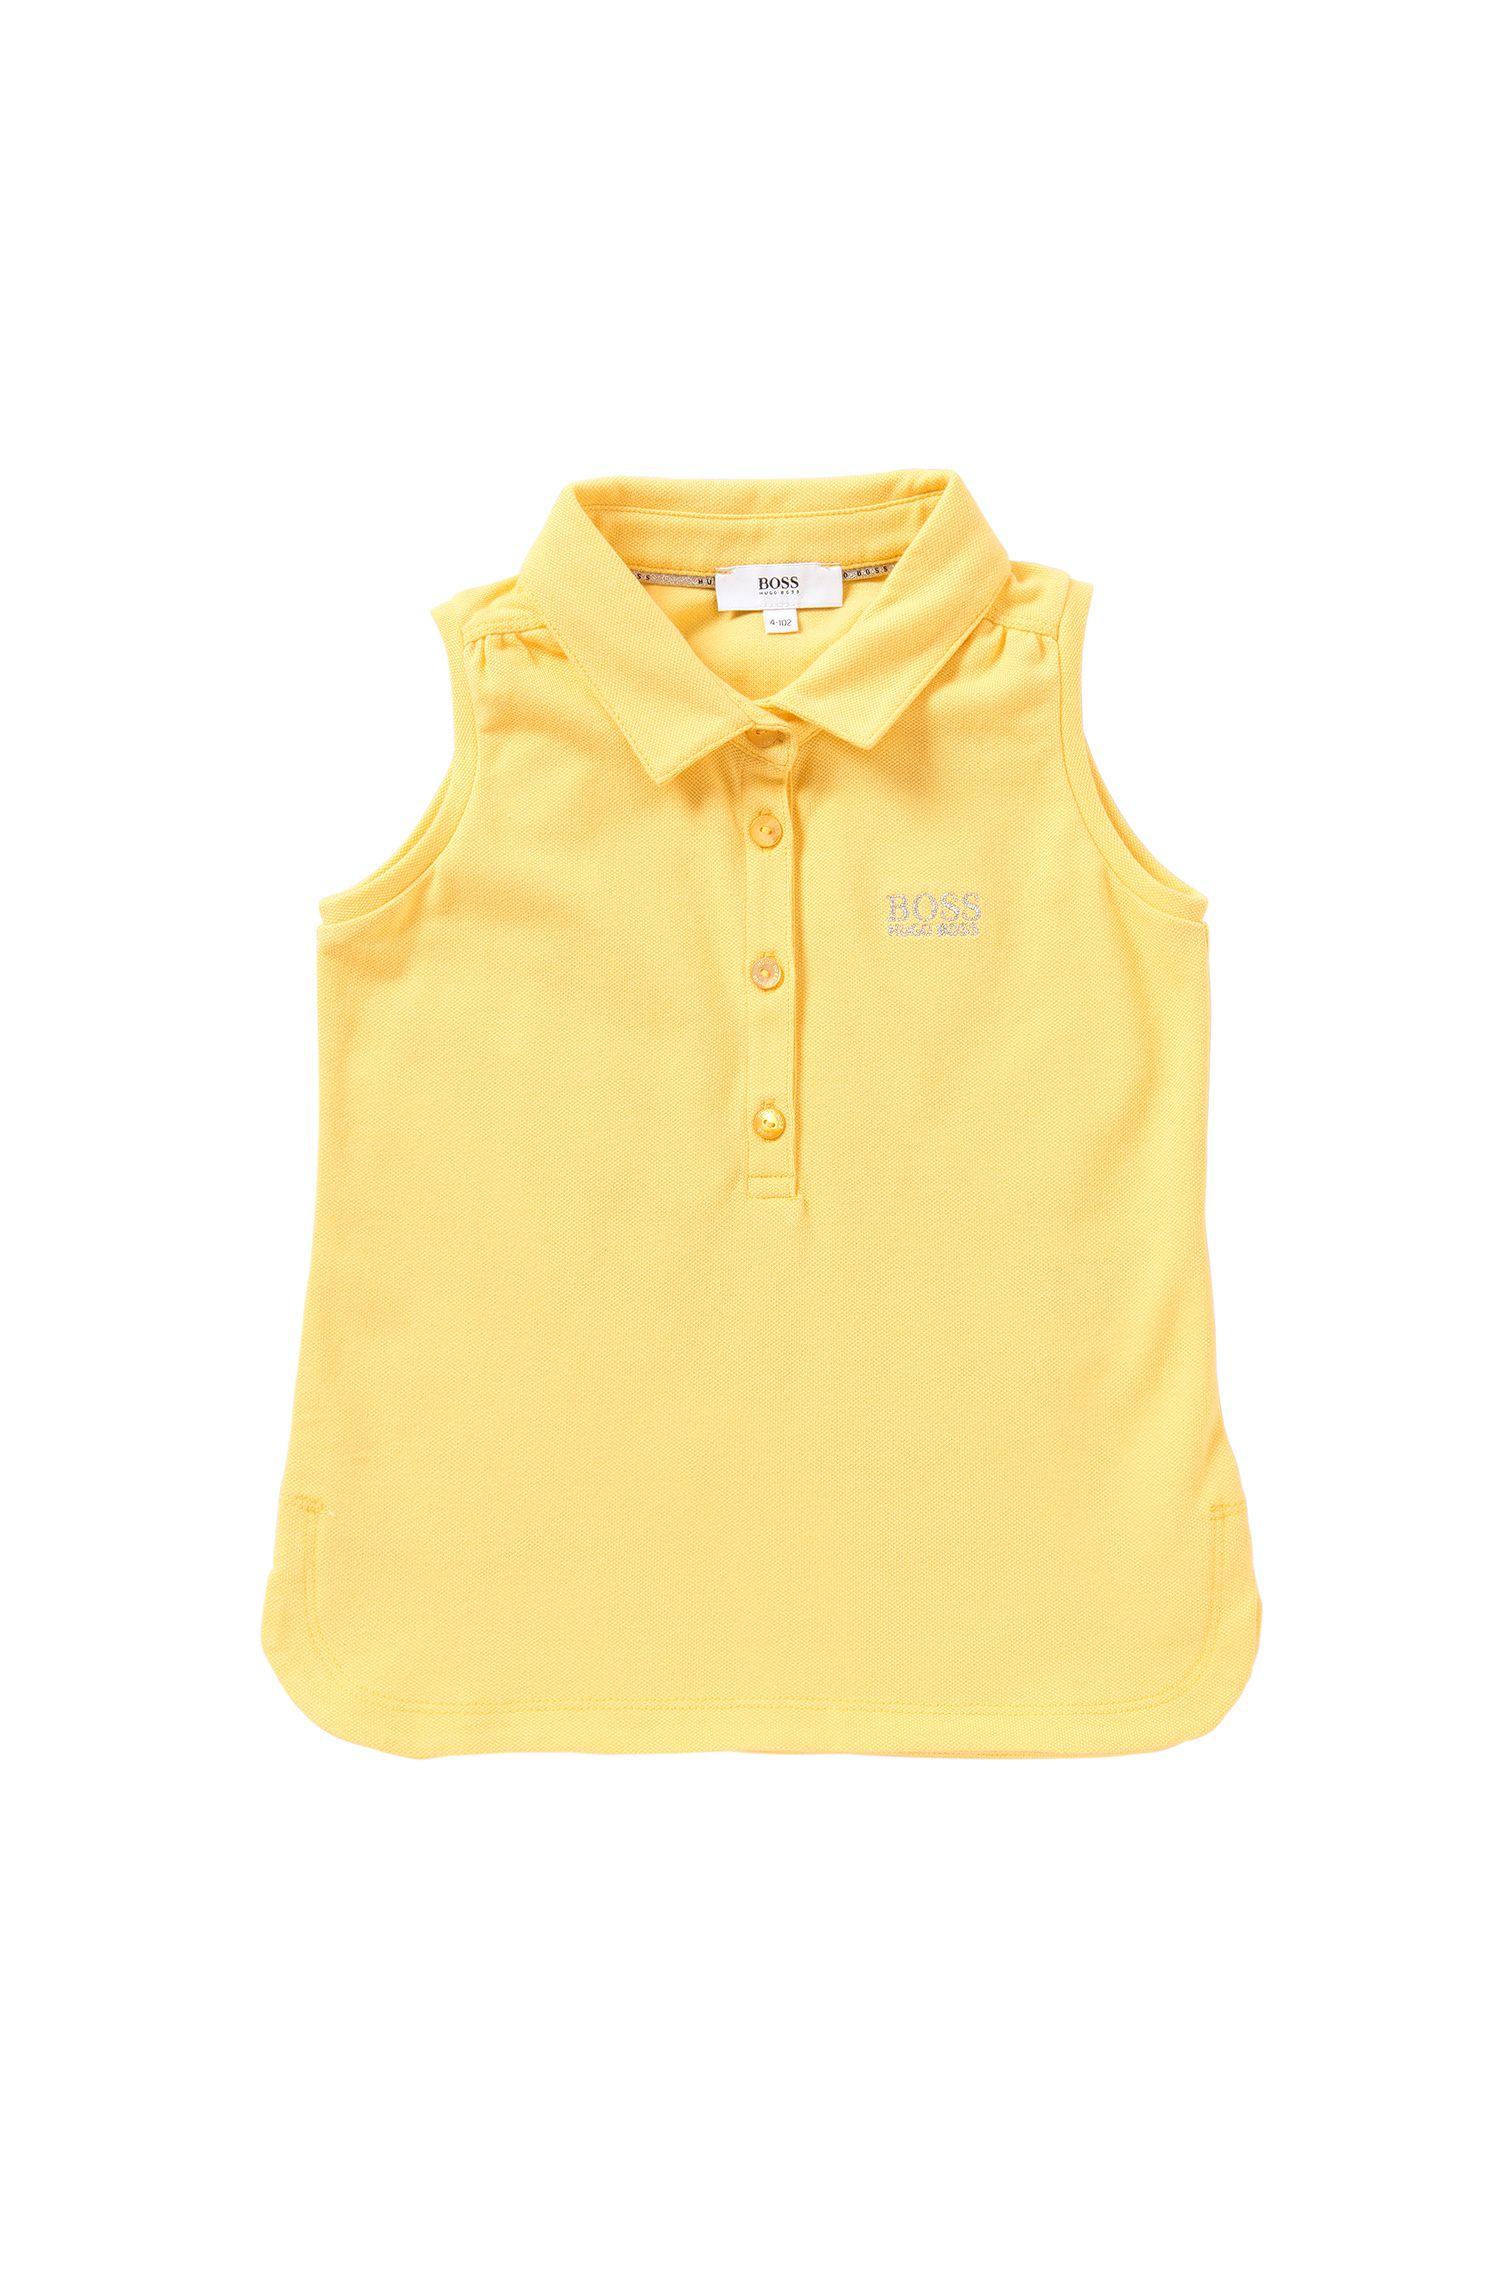 Ärmelloses Kids-Poloshirt aus Stretch-Baumwolle: 'J15344'